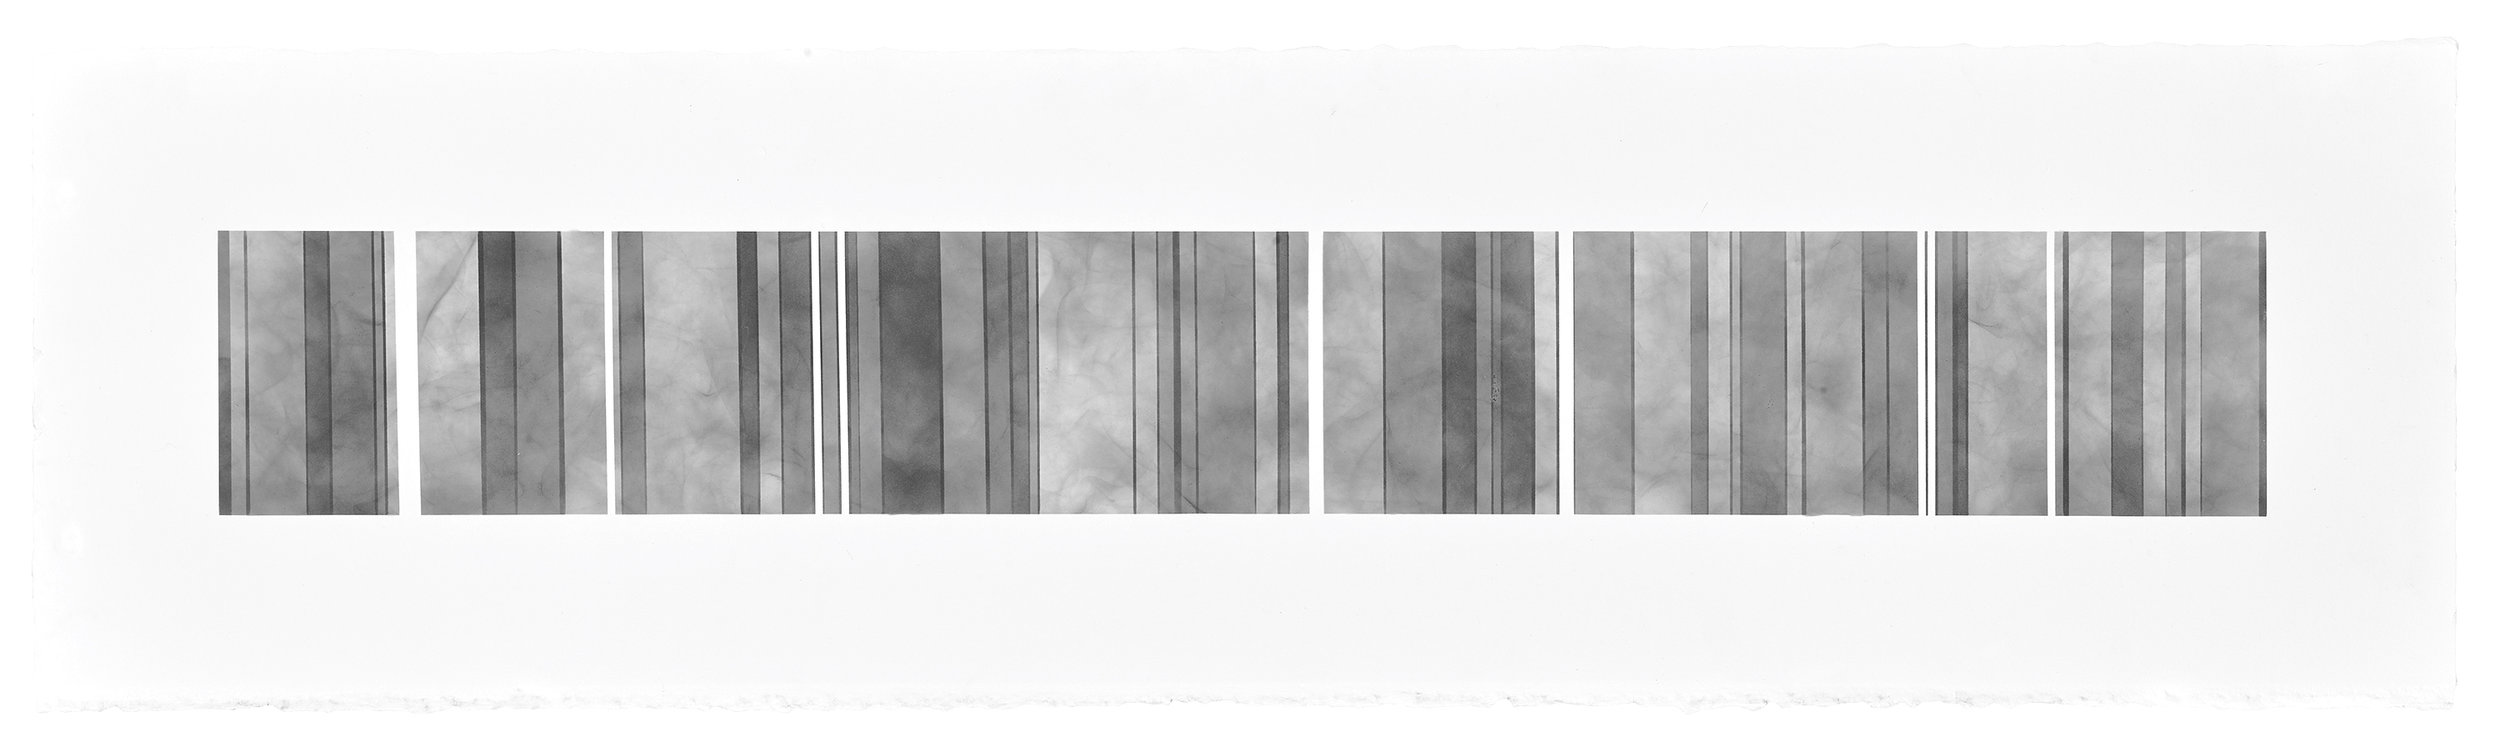 Barcode Series D 14, 2018  copy.jpg